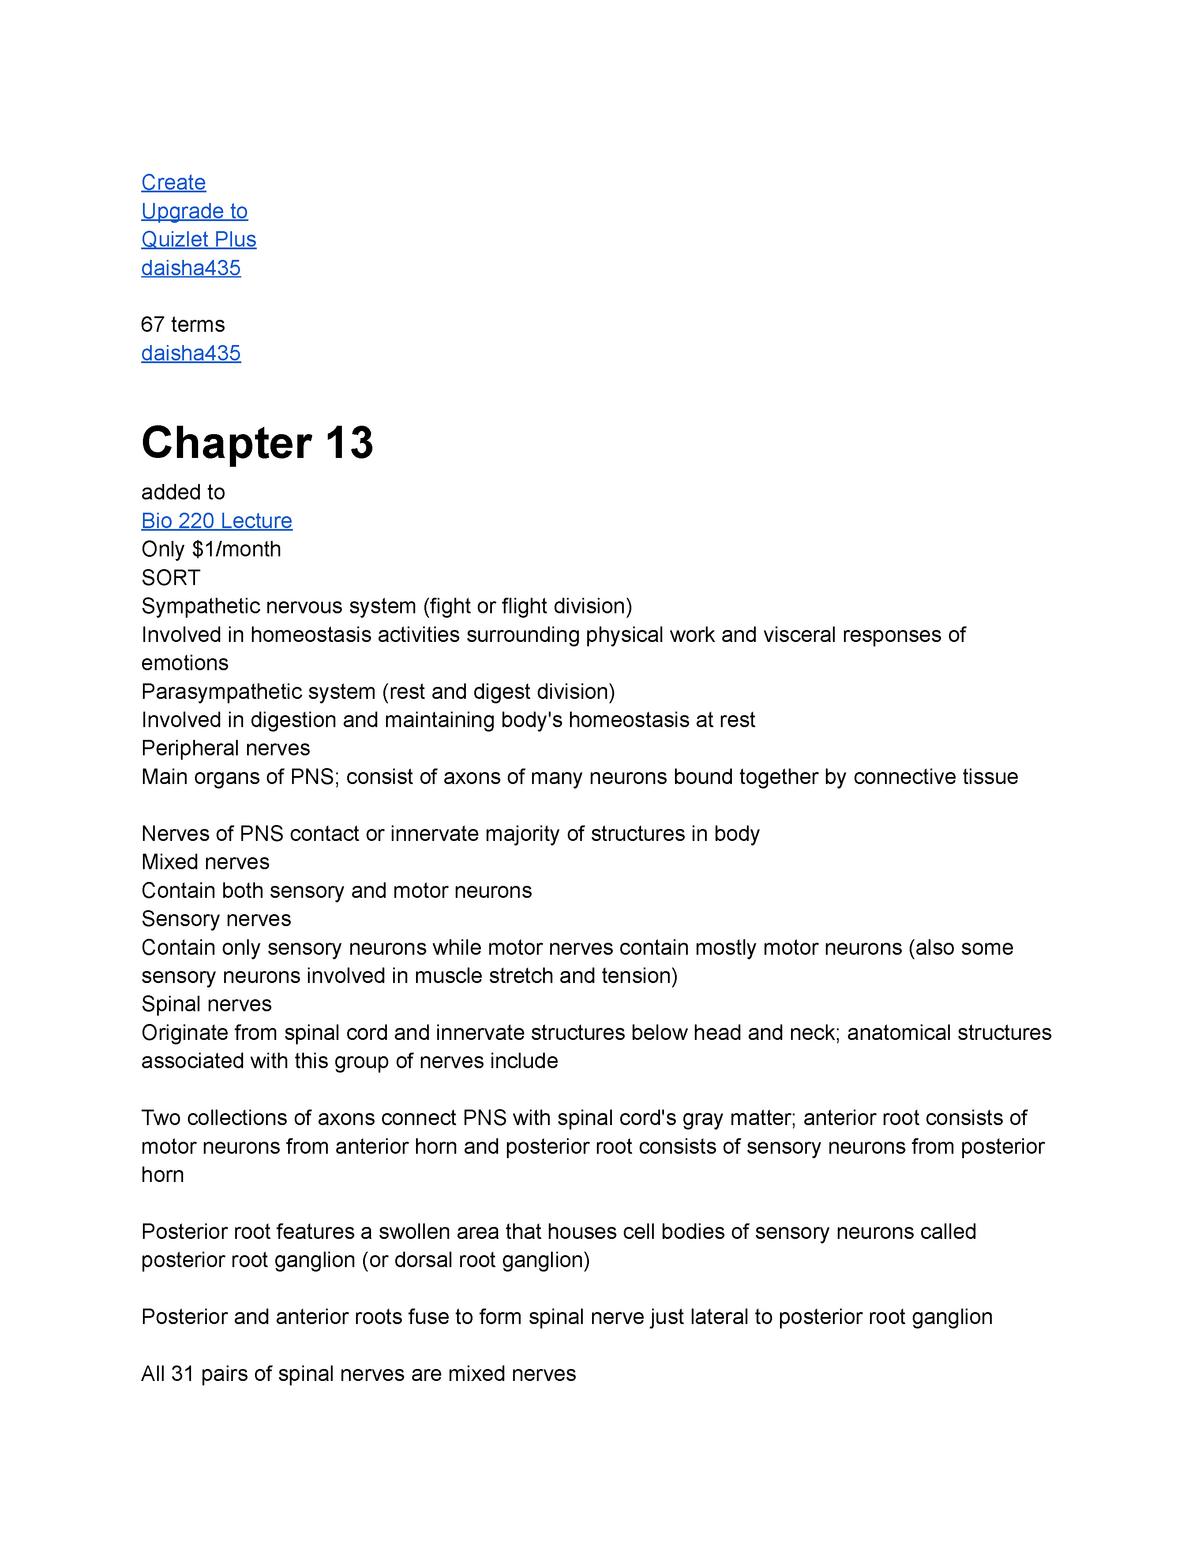 Chapter 13 - Lecture notes 13LlnznkjzNxjxnjnxp - BIOL 220